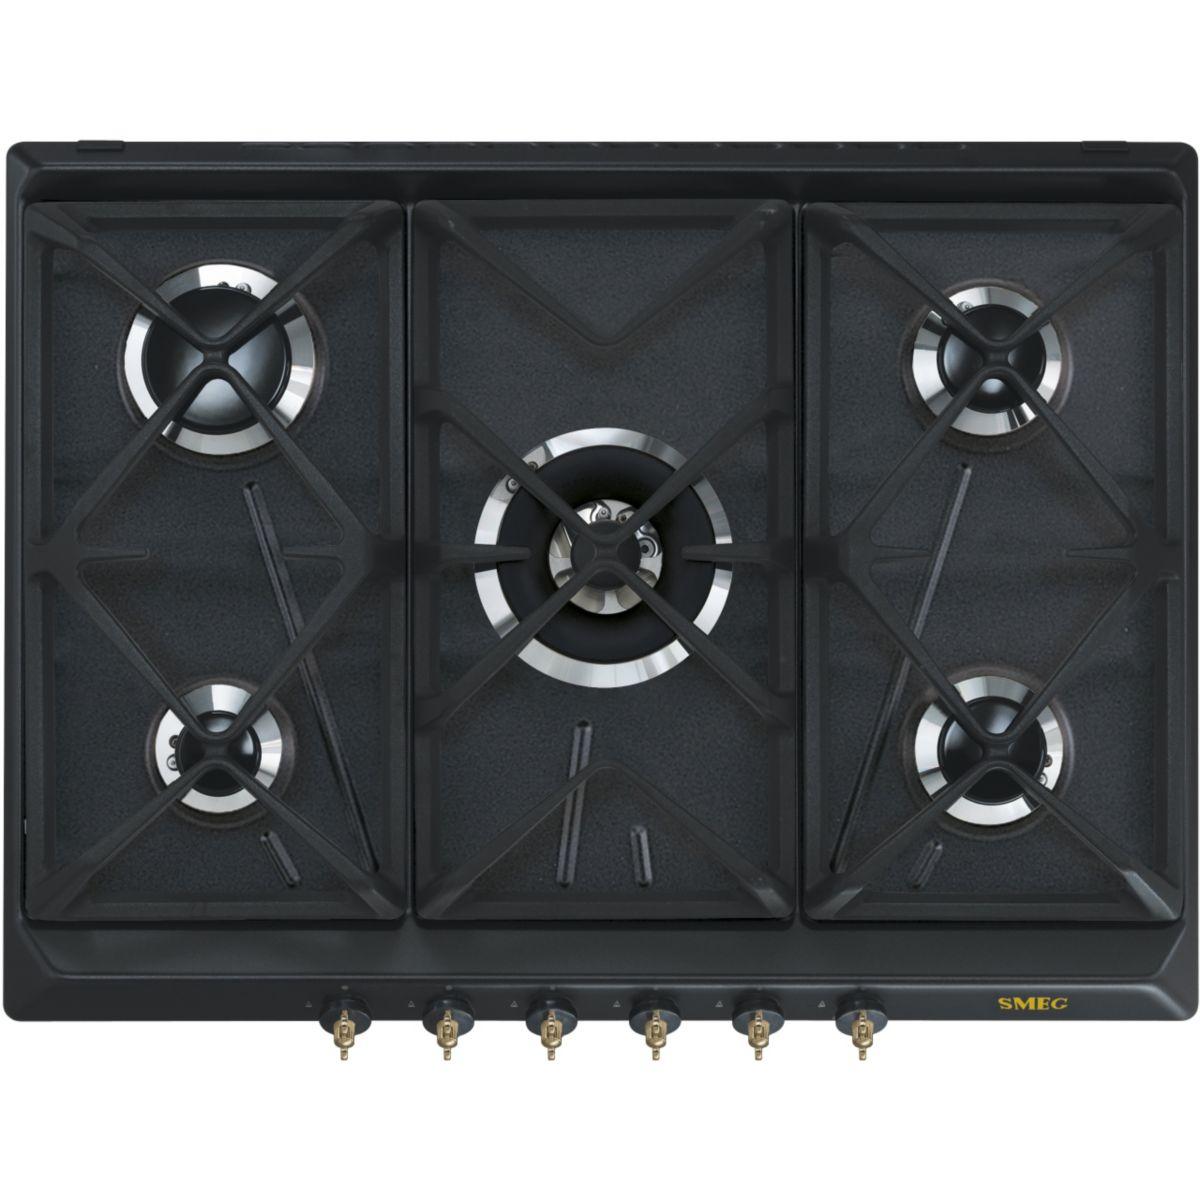 Smeg SRV876AOGH - Table de cuisson au gaz 5 foyers